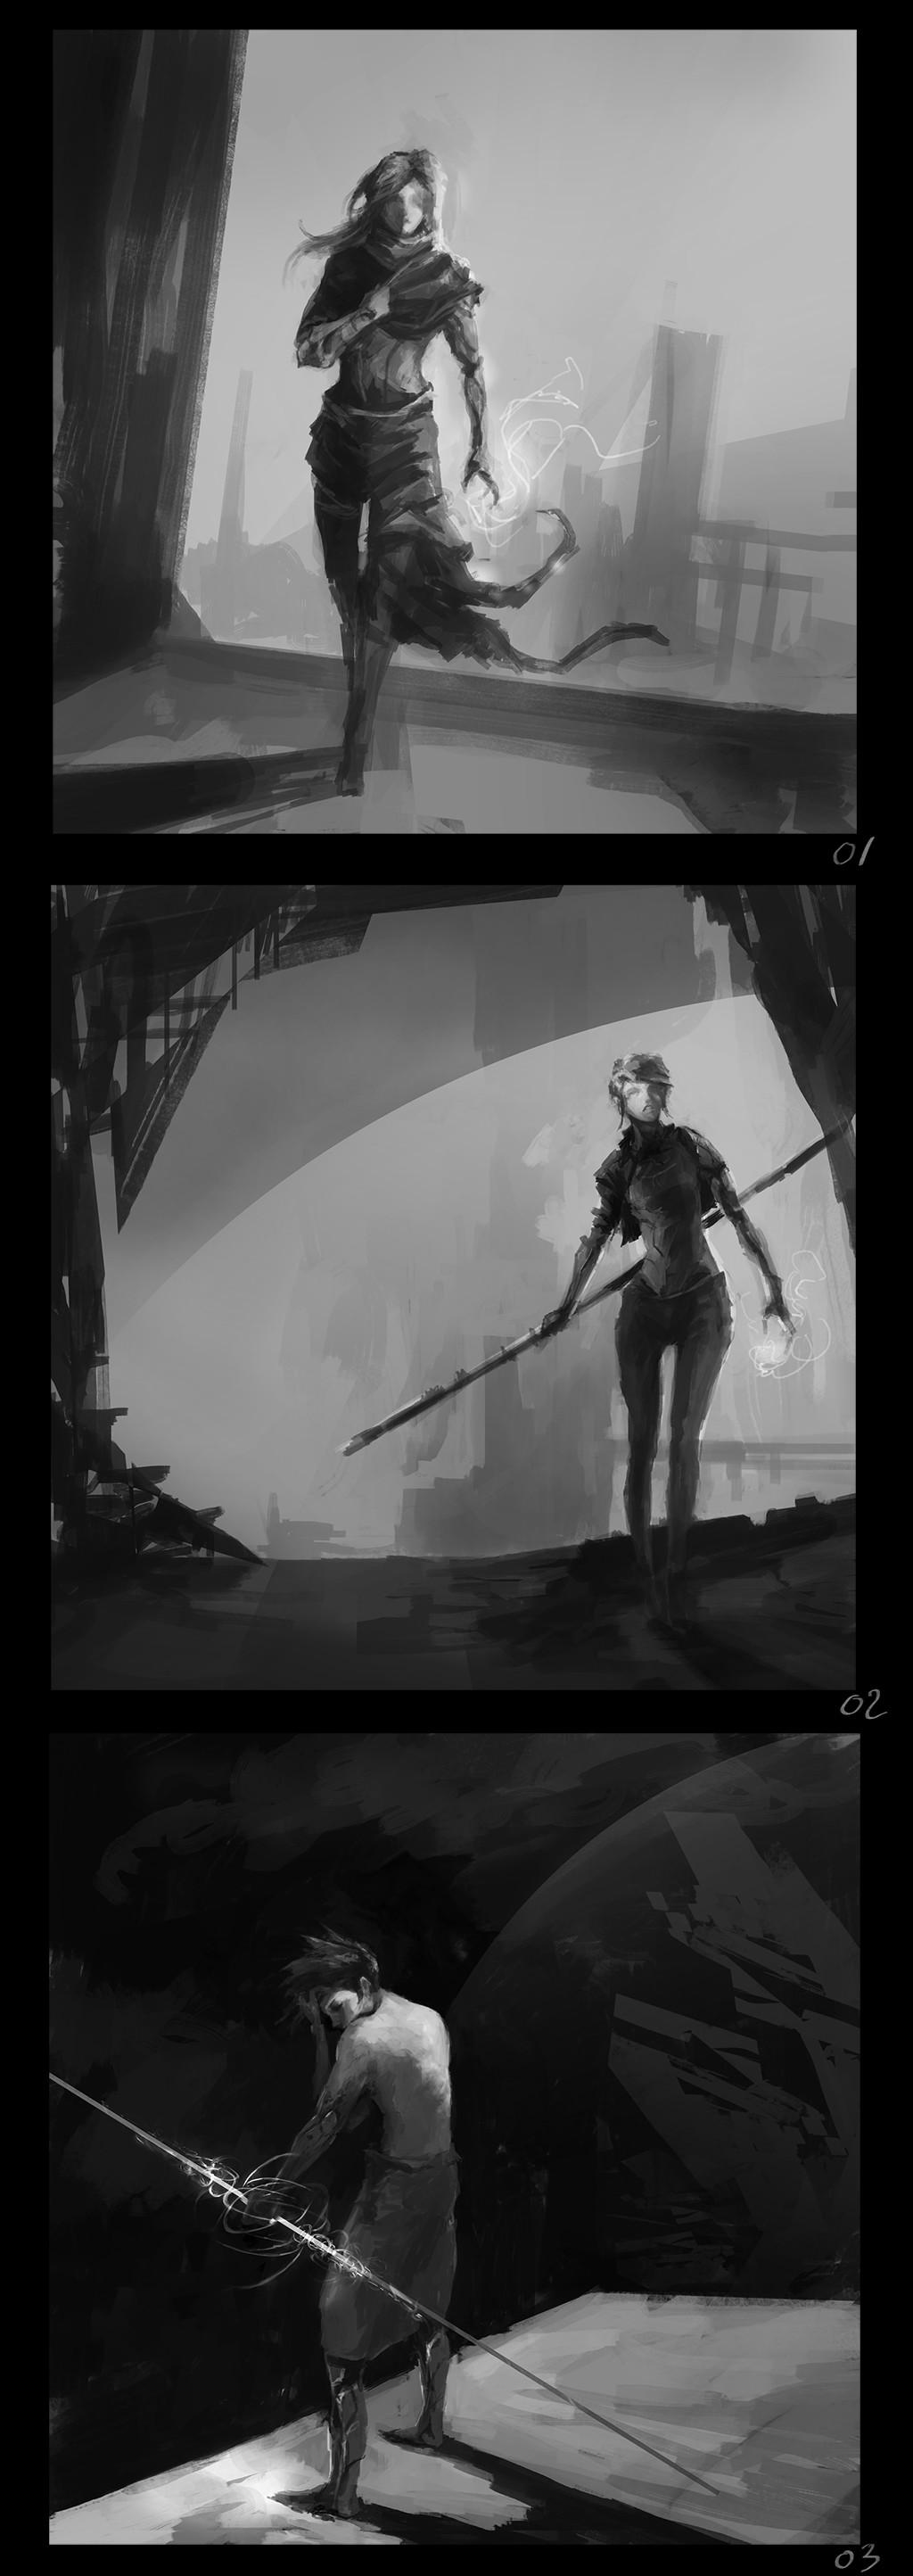 Alexandre chaudret dos aspect 01 sketches